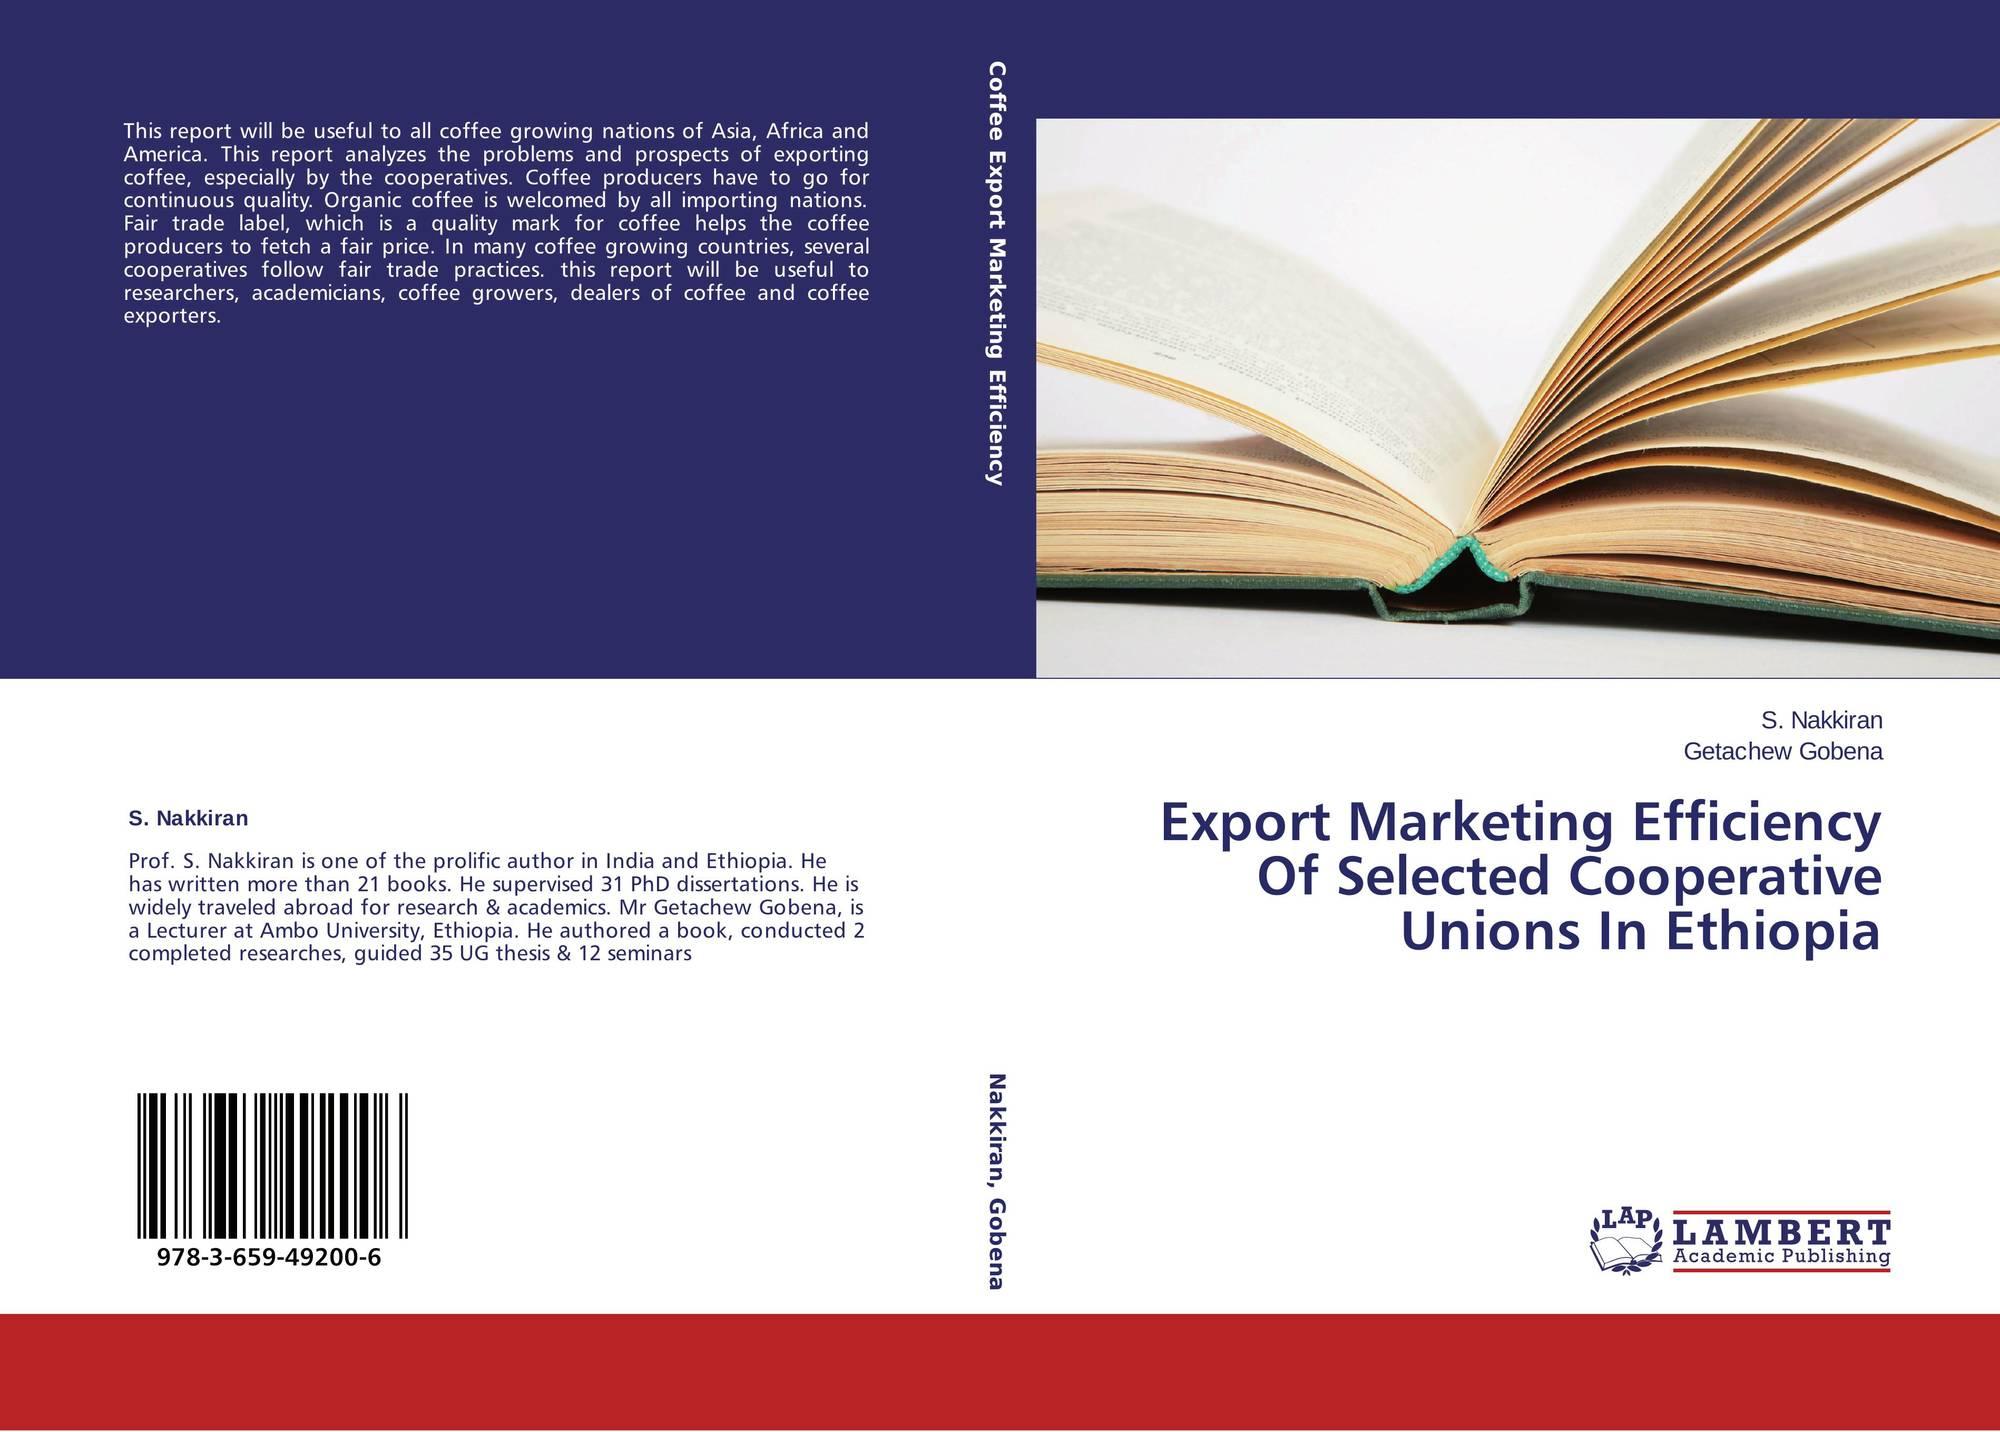 Staples dissertation binding cost